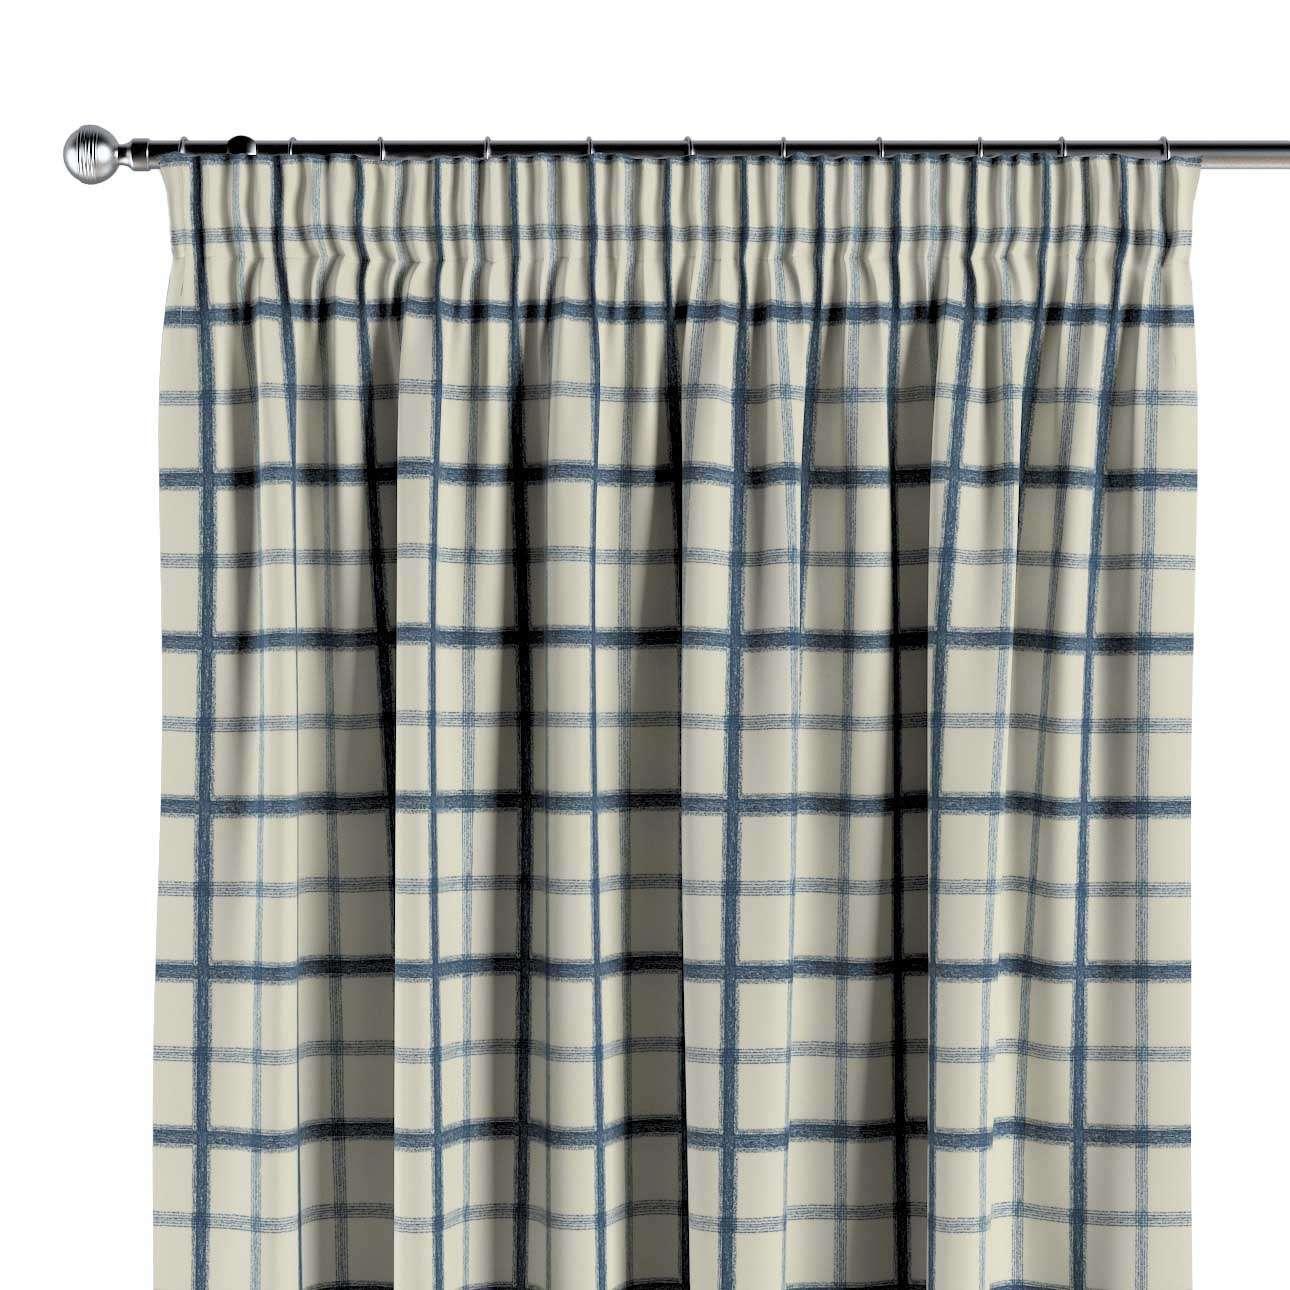 Pencil pleat curtain in collection Avinon, fabric: 131-66